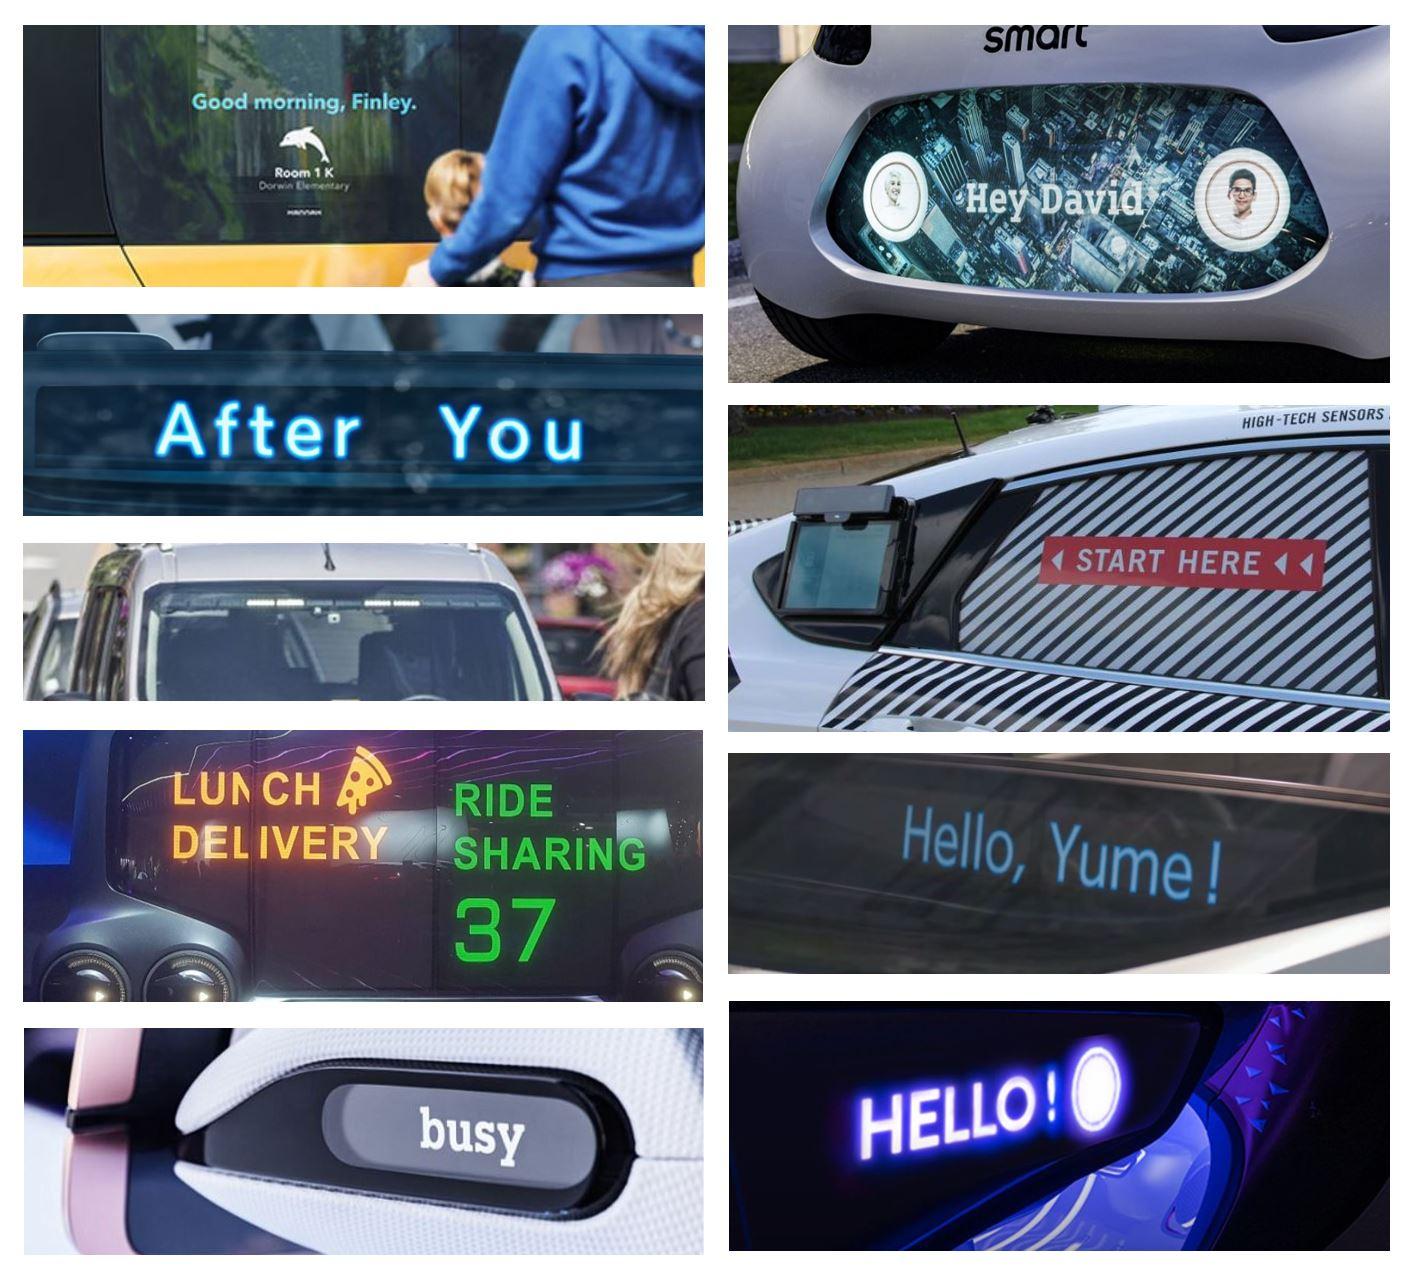 Robot_signs_many.JPG